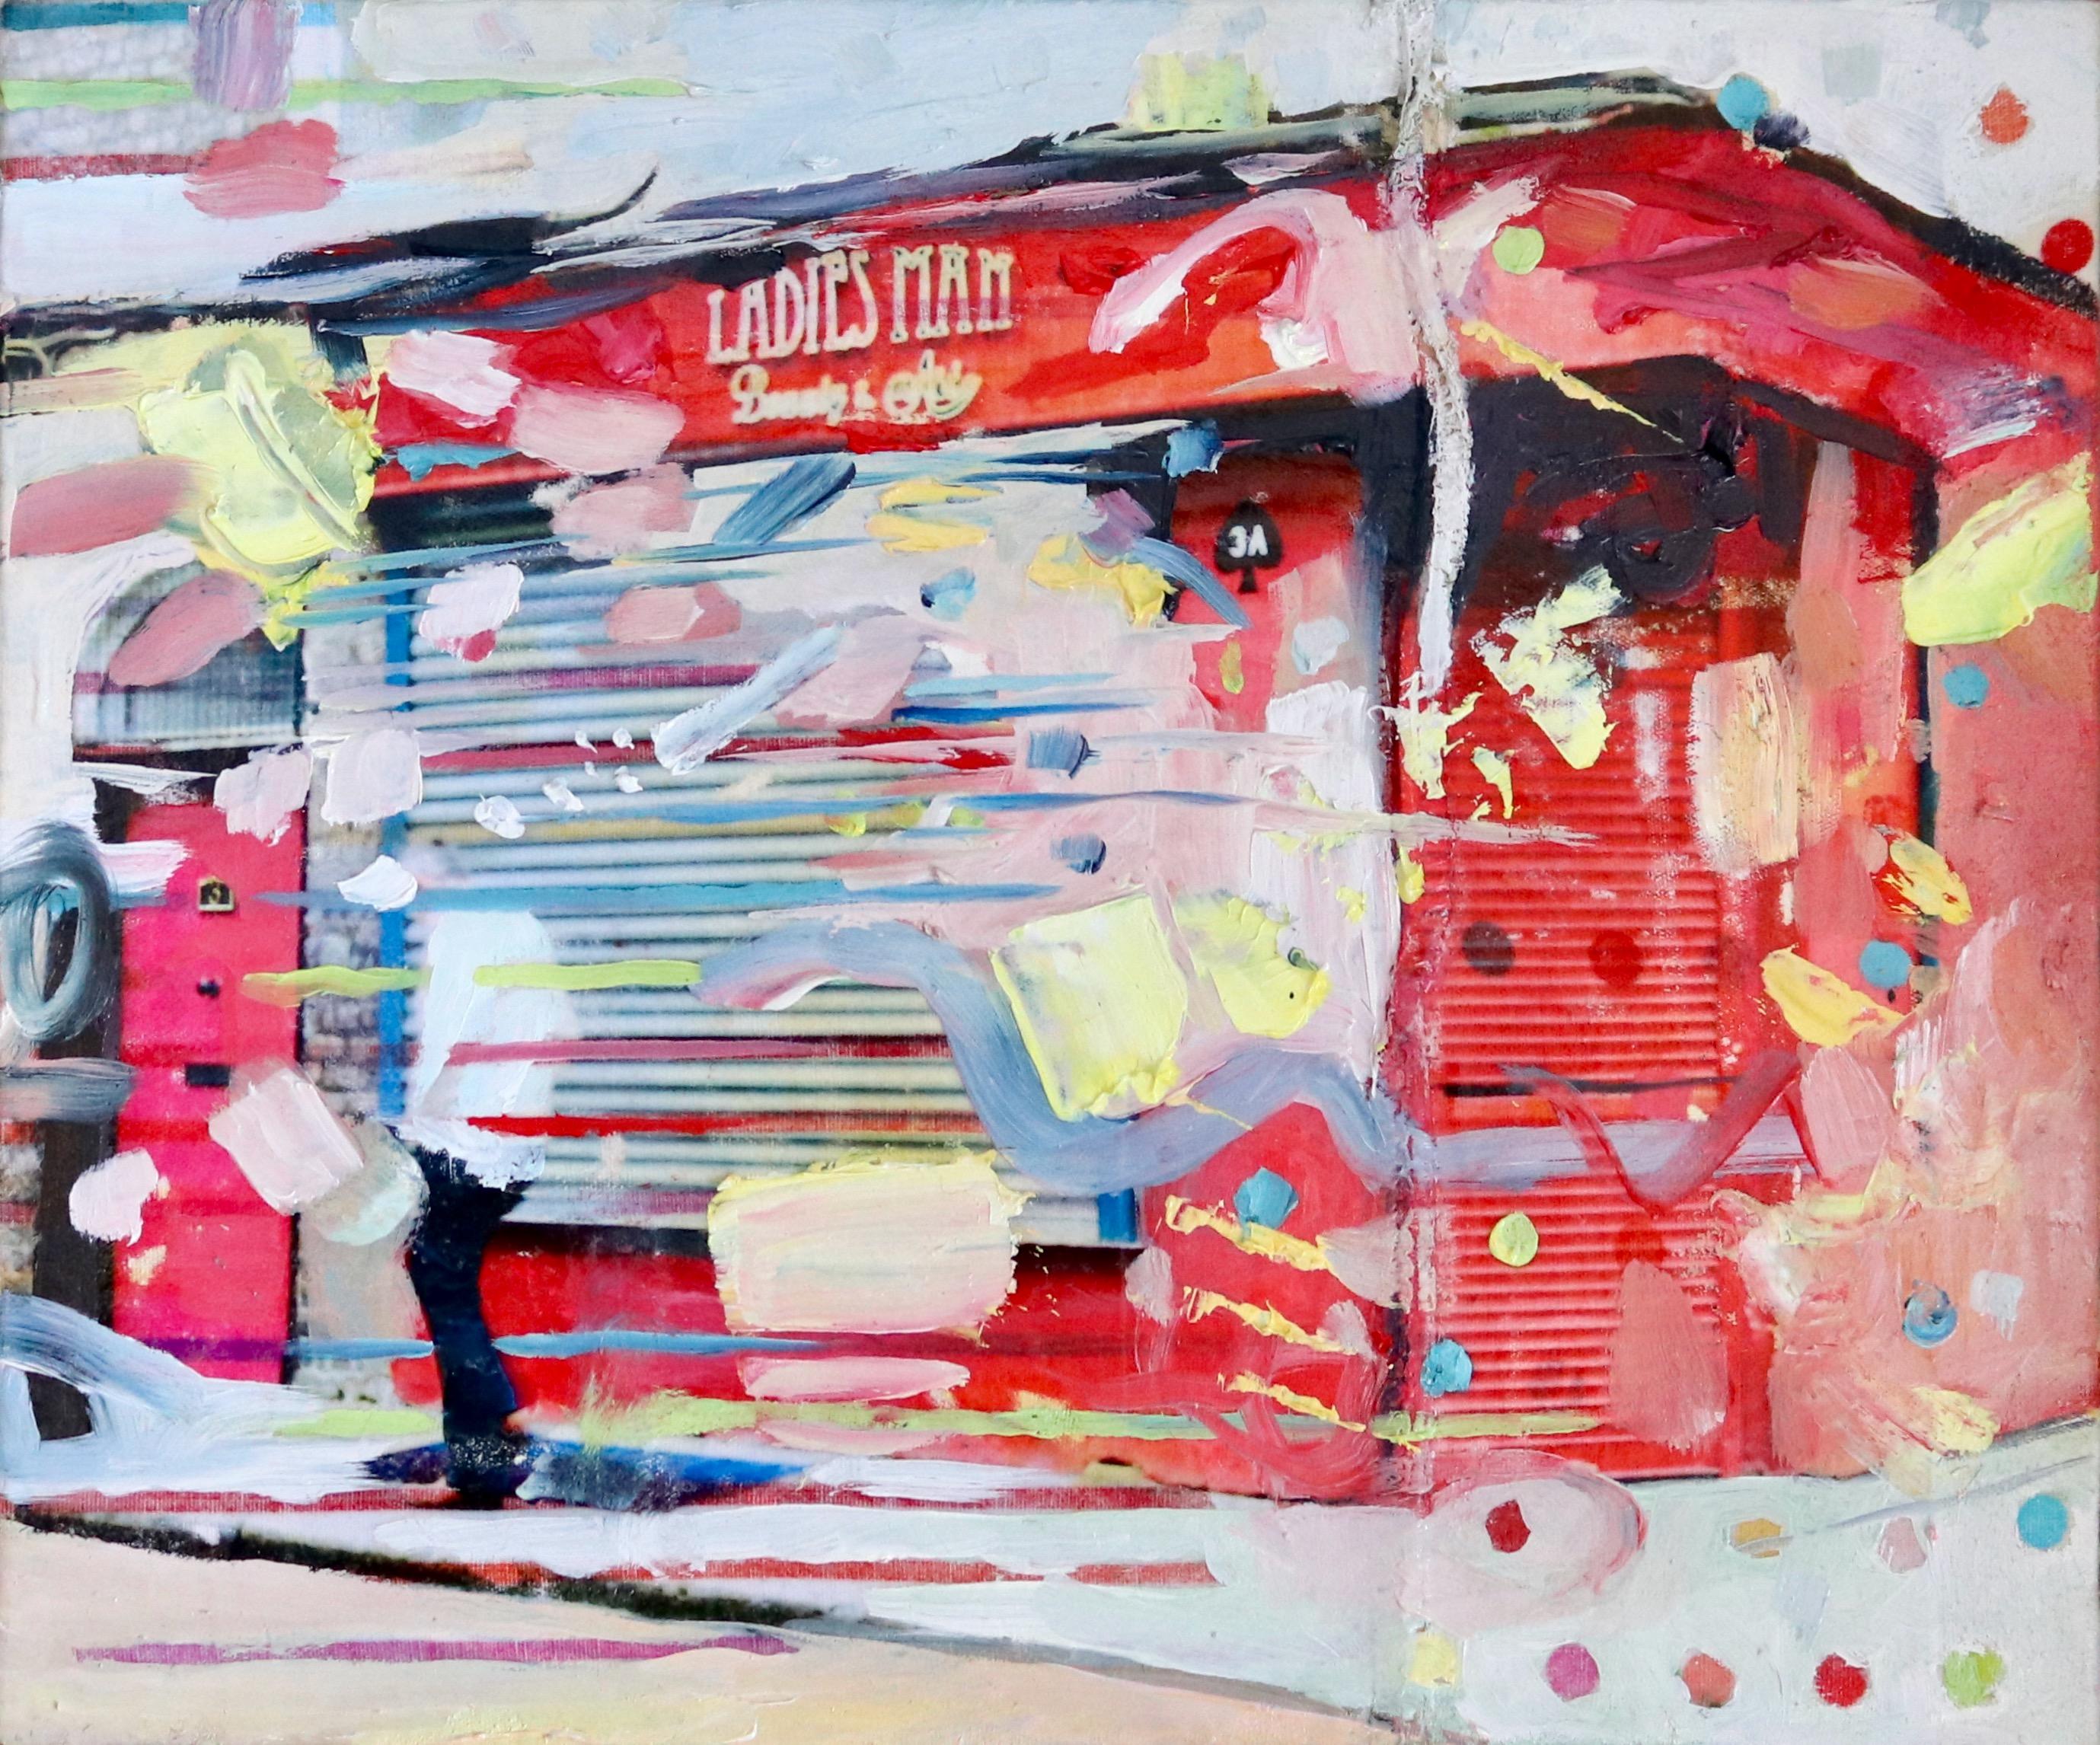 Susanne Wawra, Ladies Man, 2017.